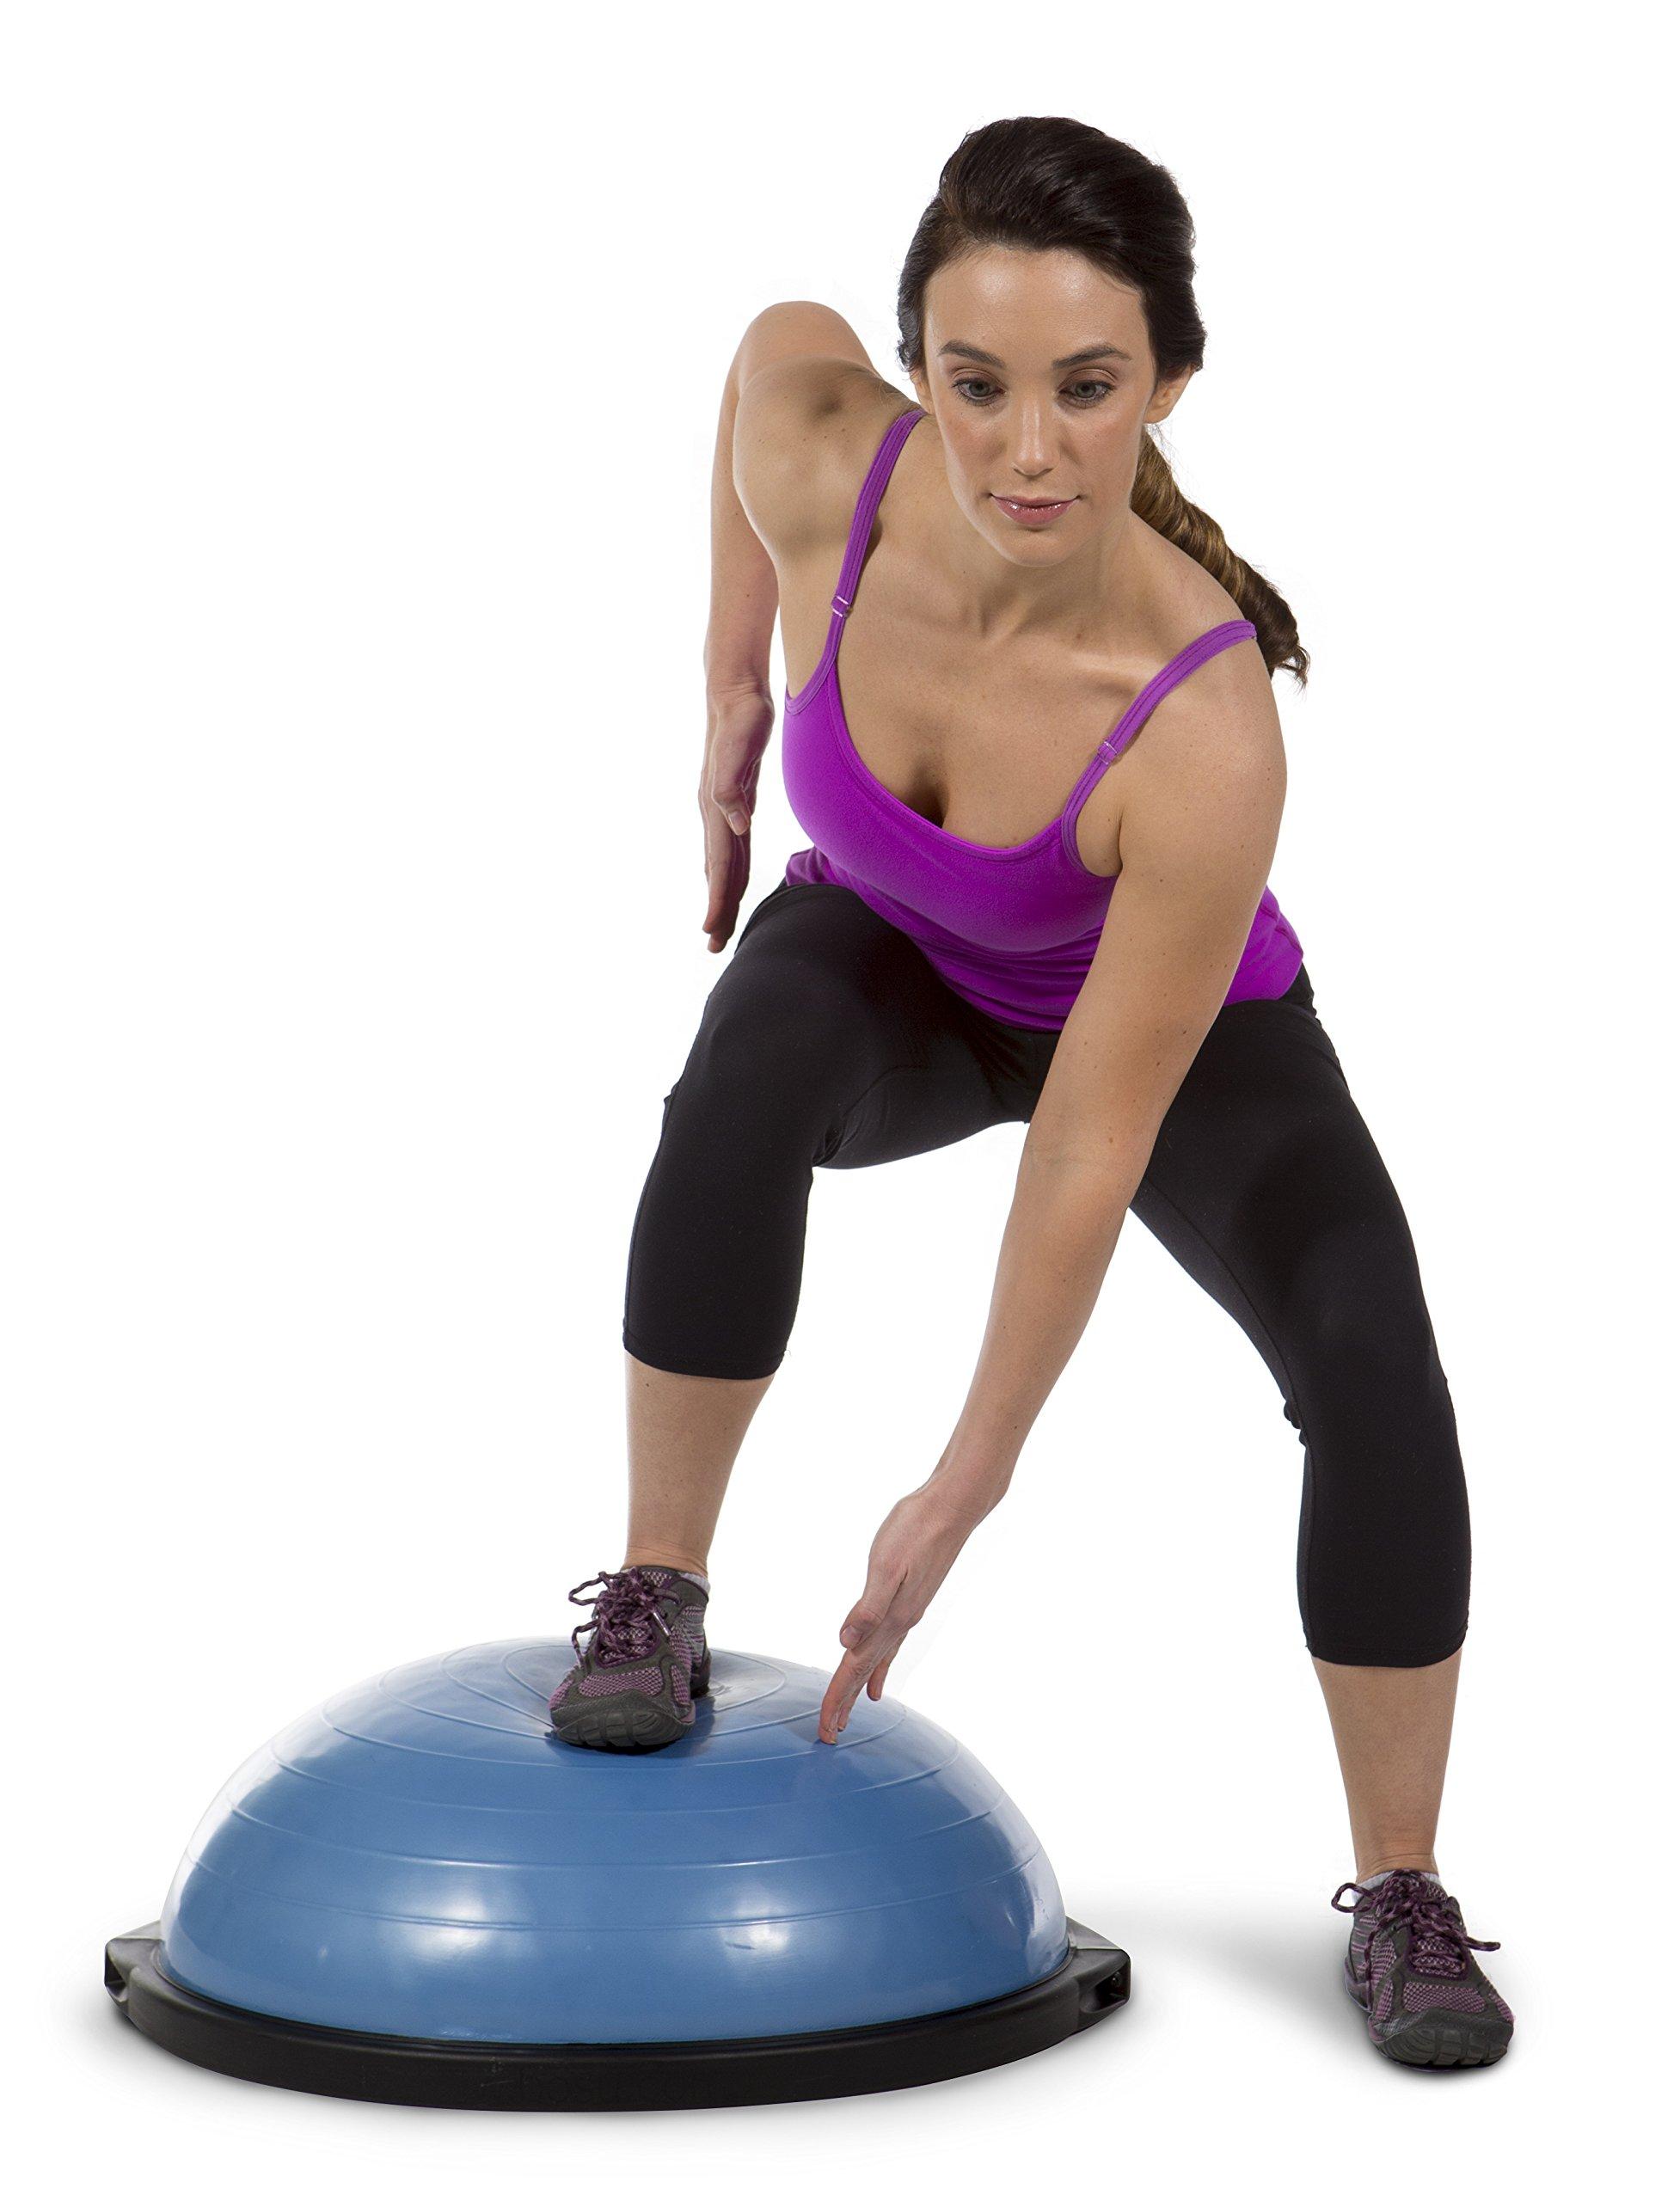 Bosu Balance Trainer, 65cm The Original - Lime Green by Bosu (Image #6)